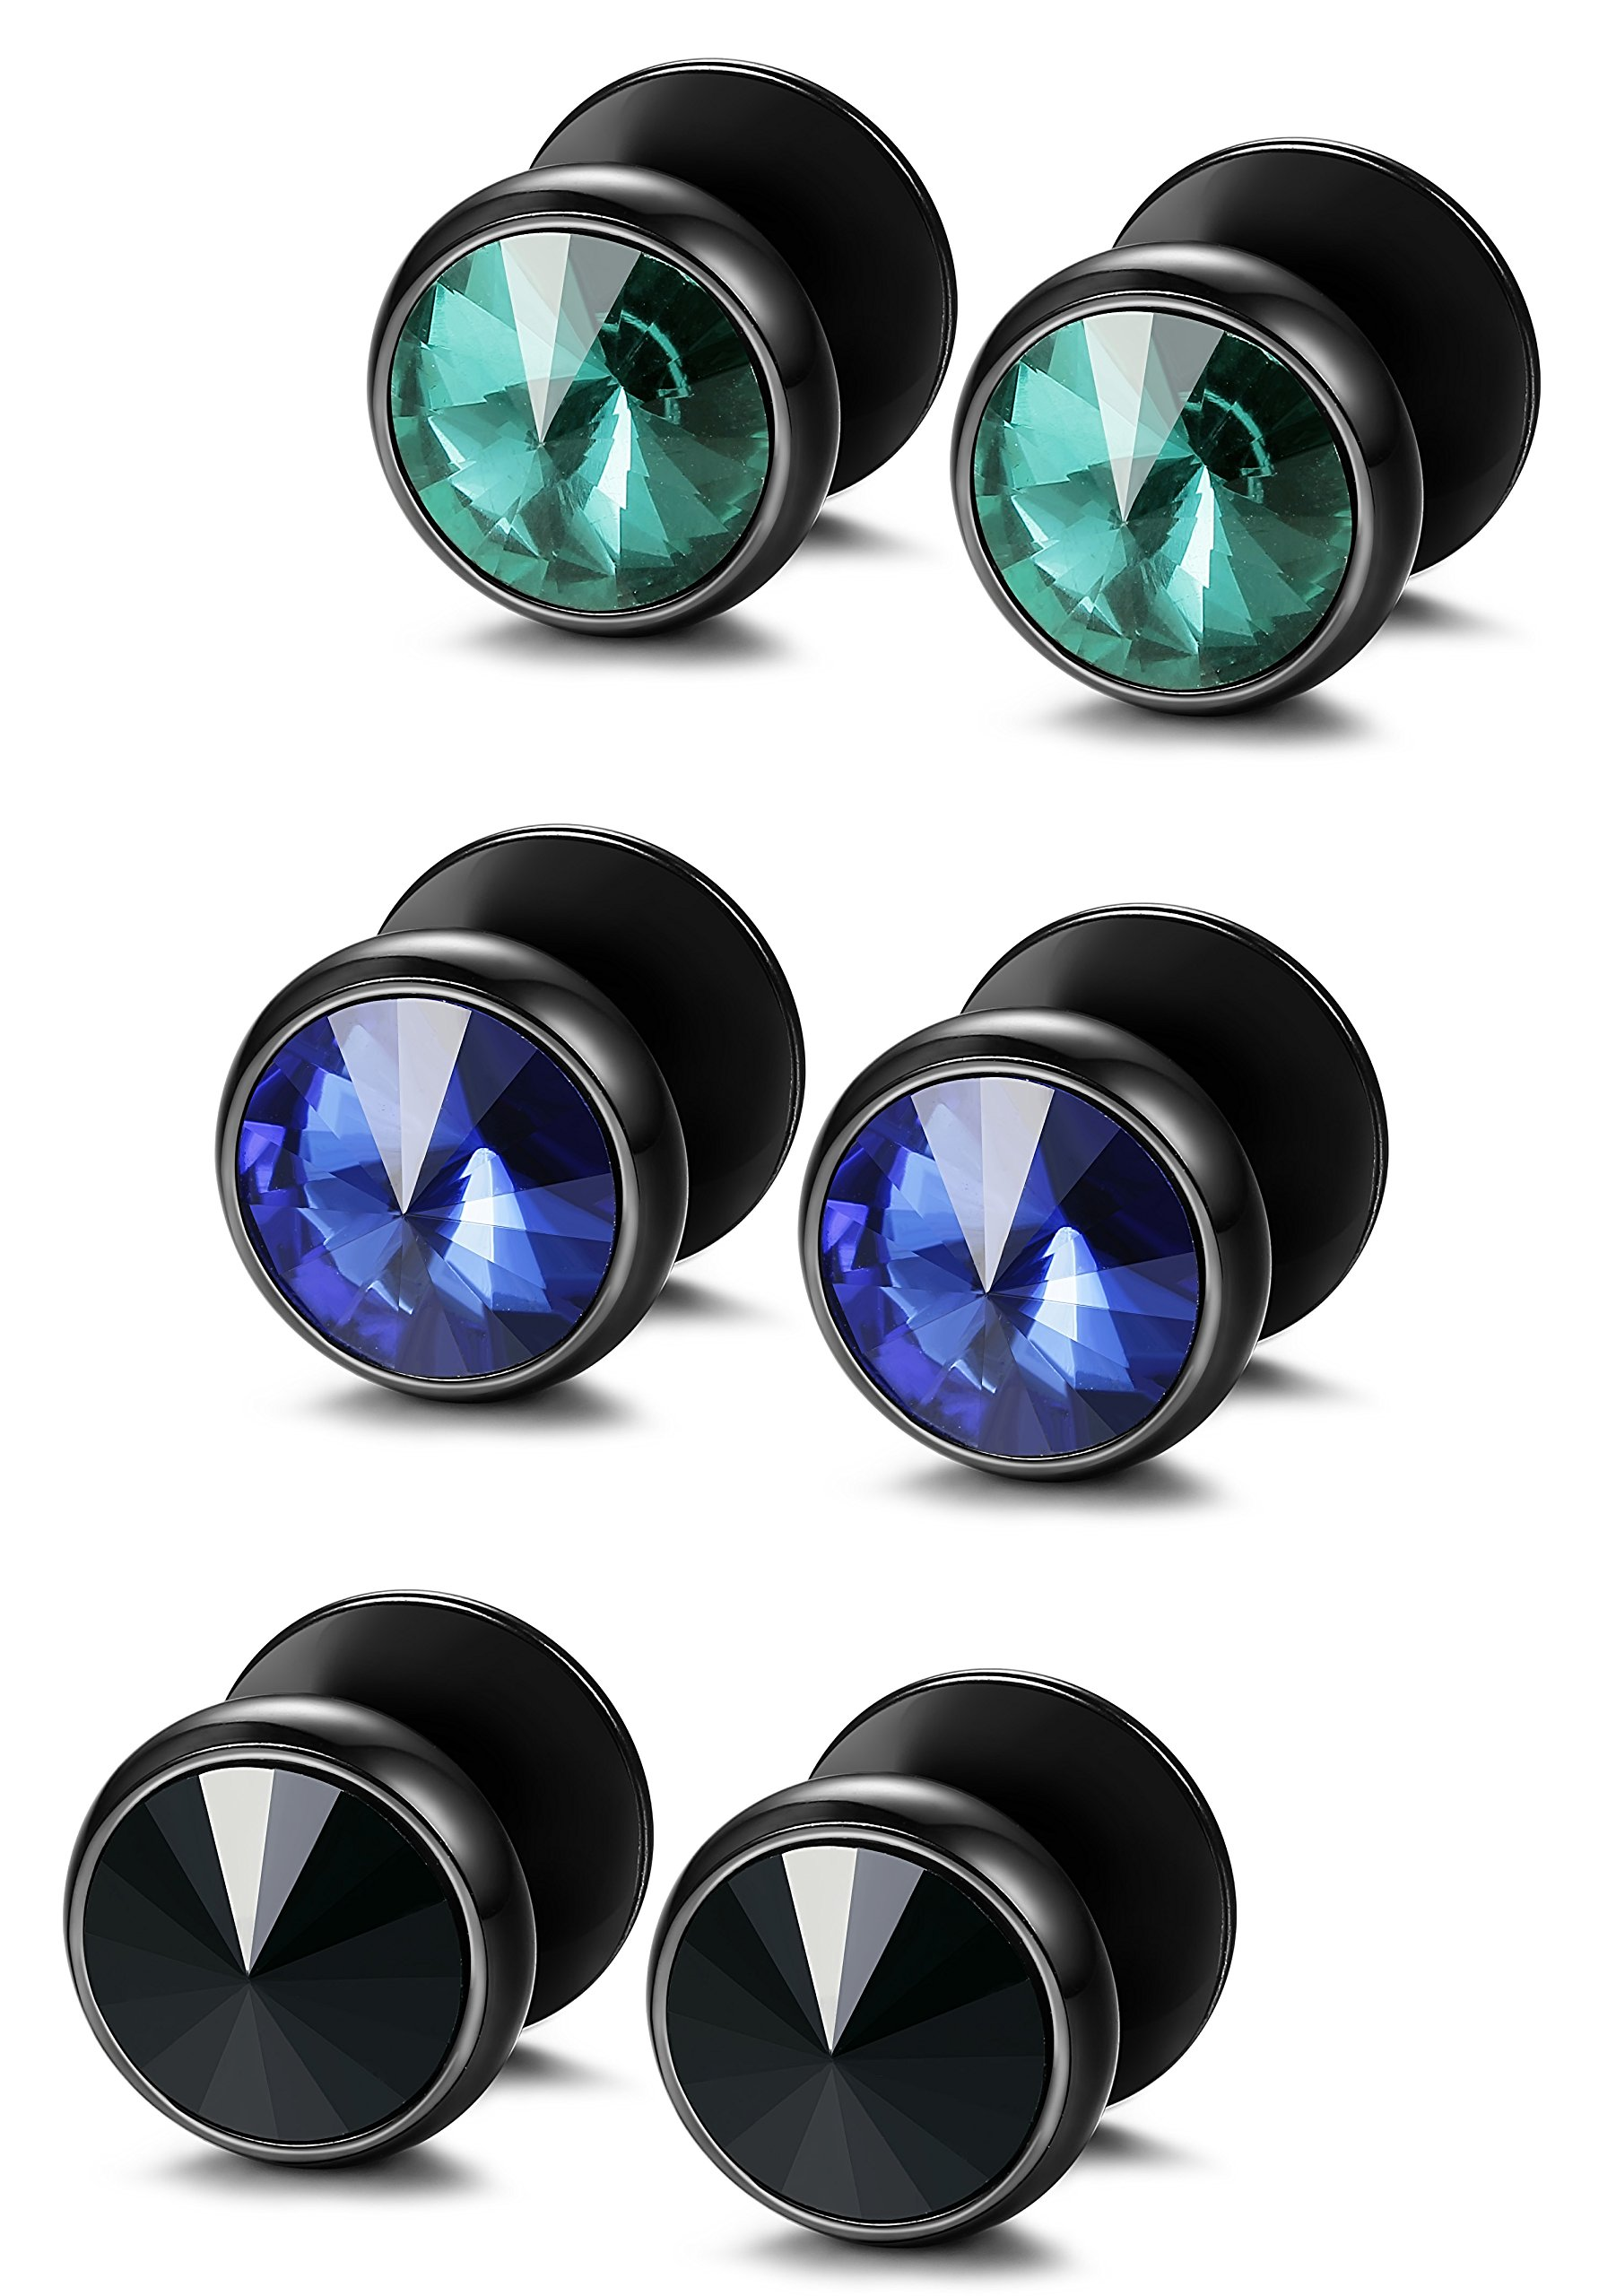 FIBO STEEL 3 Pairs Stainless Steel Round Stud Earrings for Men Women CZ Earrings,8MM